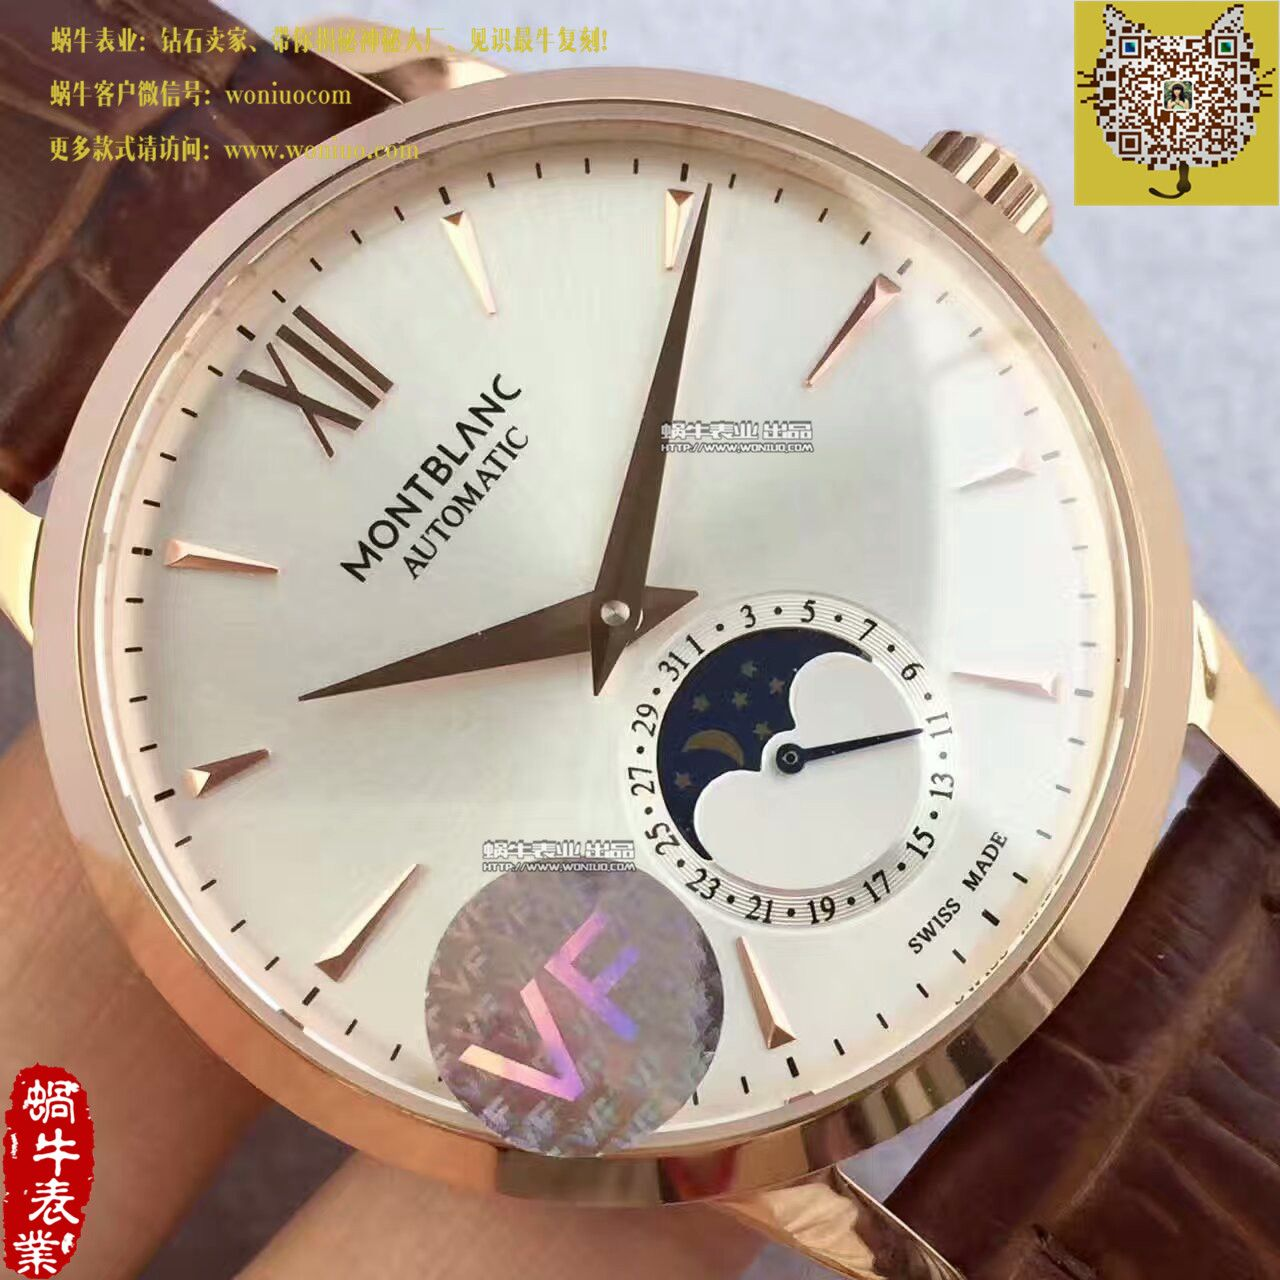 【VF1:1顶级高仿手表】万宝龙HERITAGE SPIRIT系列U0111185腕表 / MB002